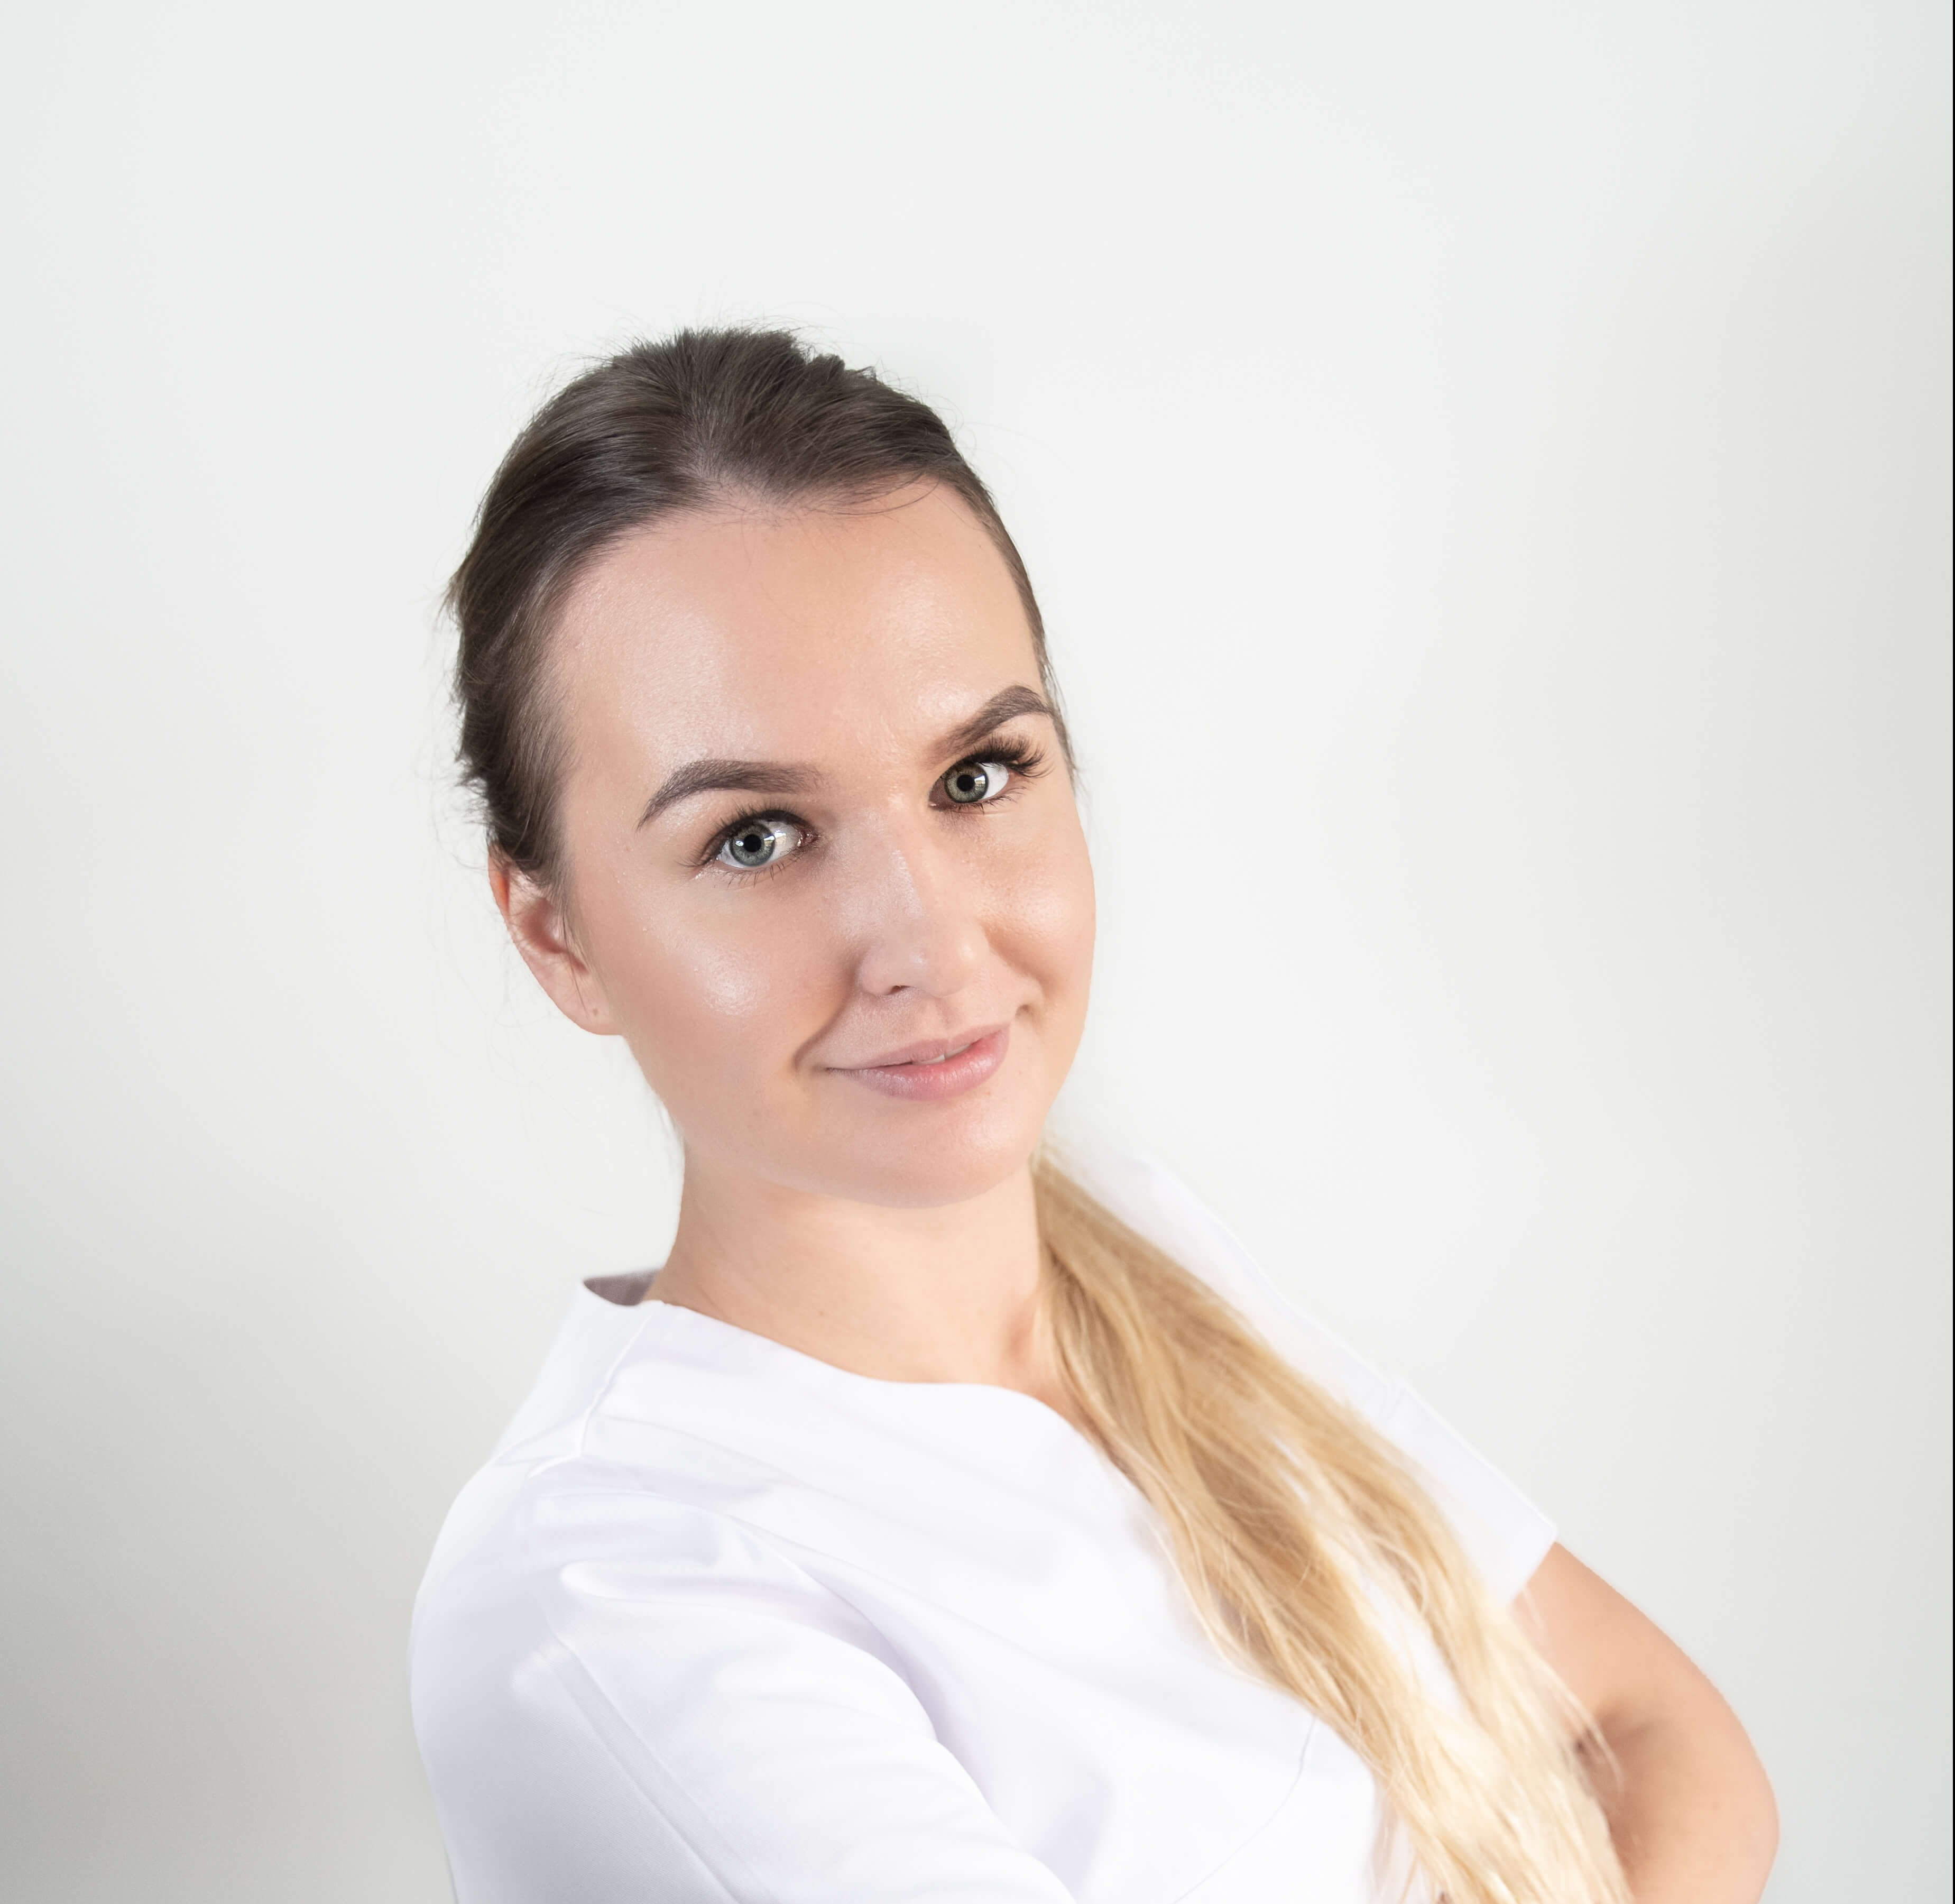 Marcelina Agacka